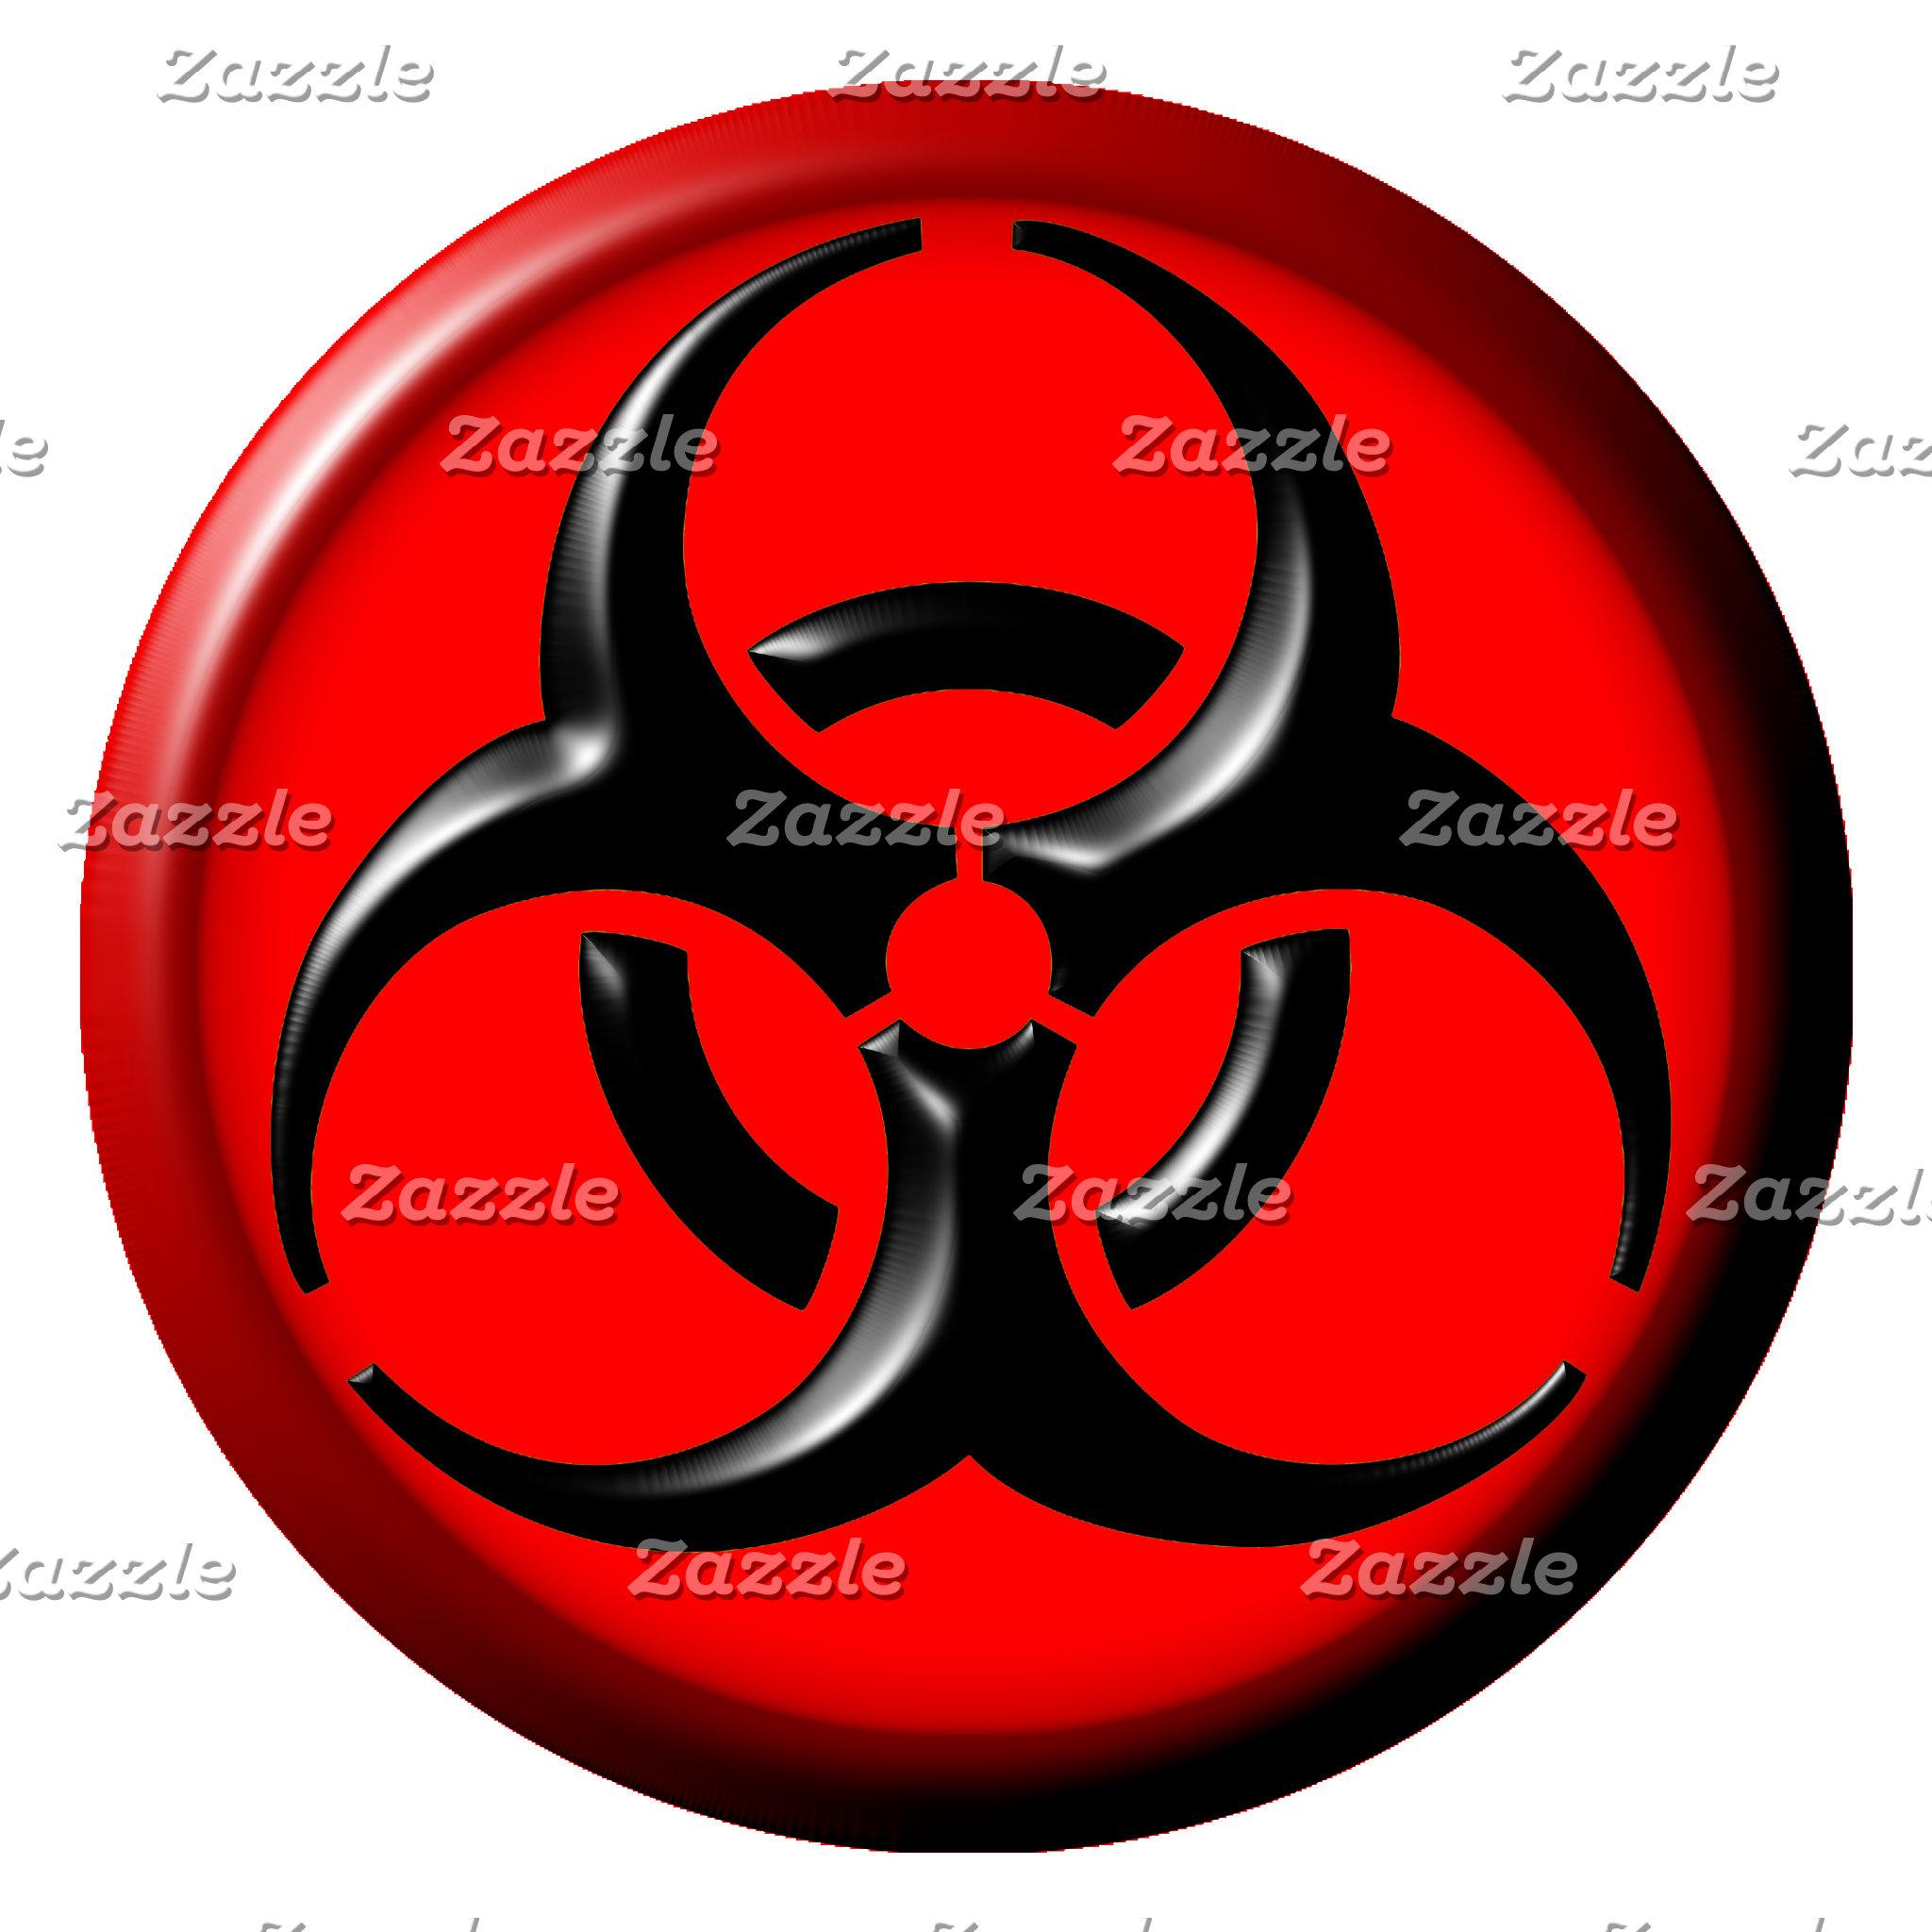 BioHazard Toxic Red